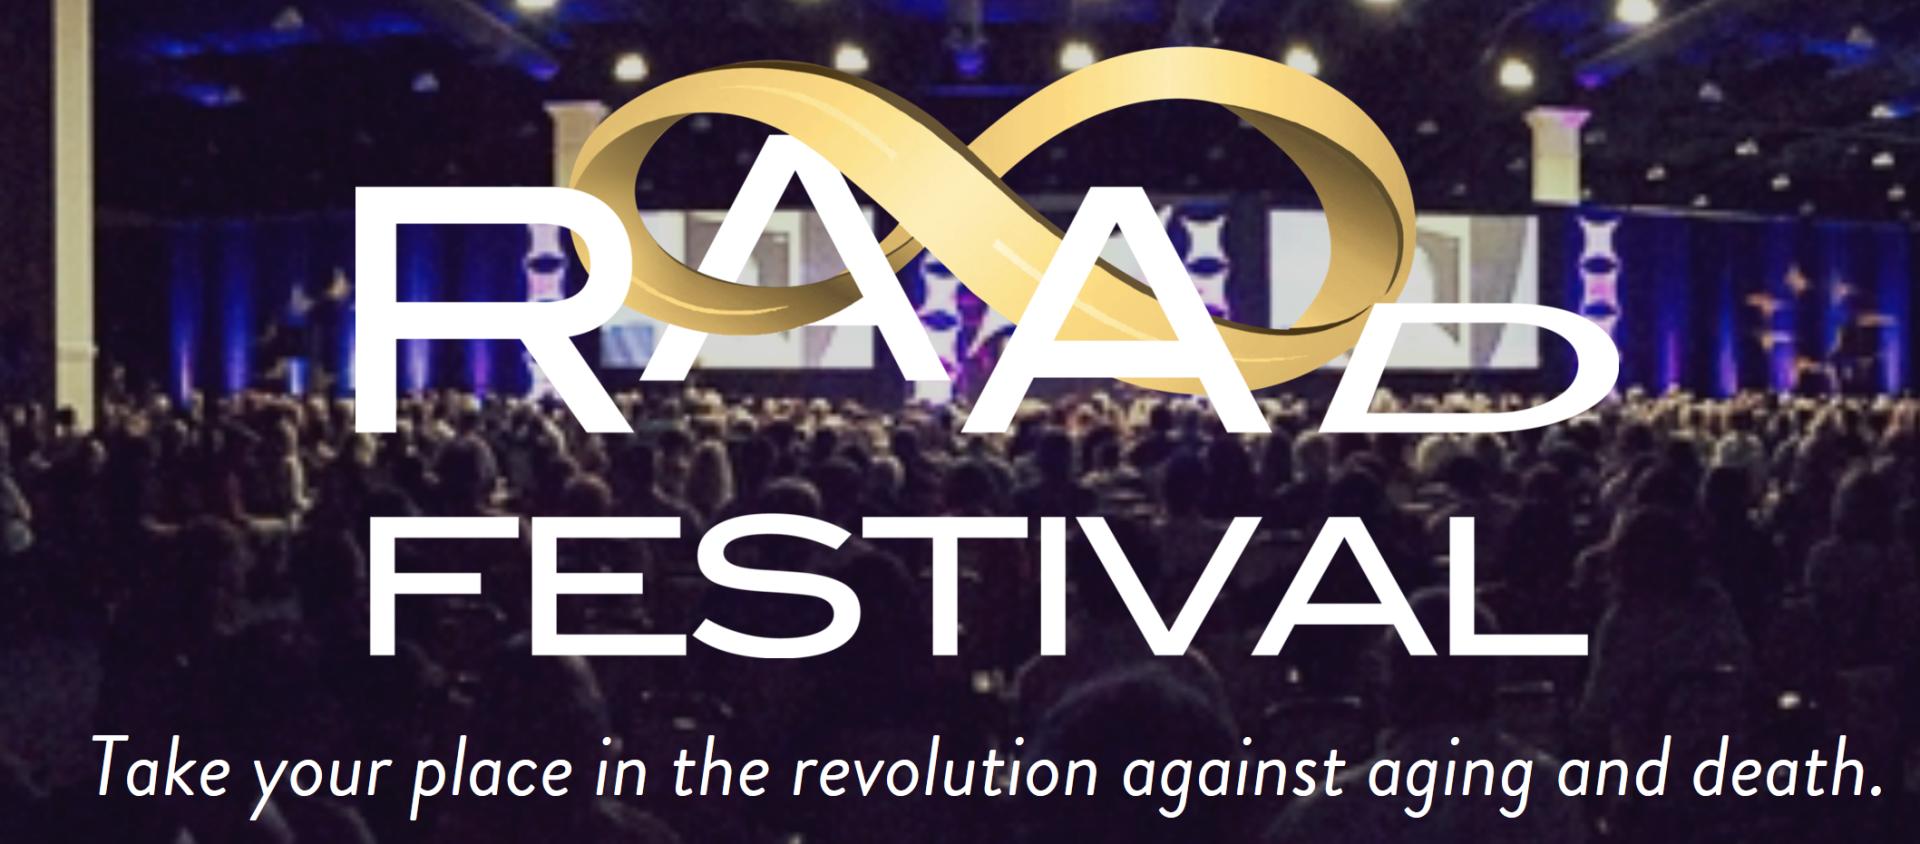 QLARIVIA-Gold Sponsor of Raad Fest 2016